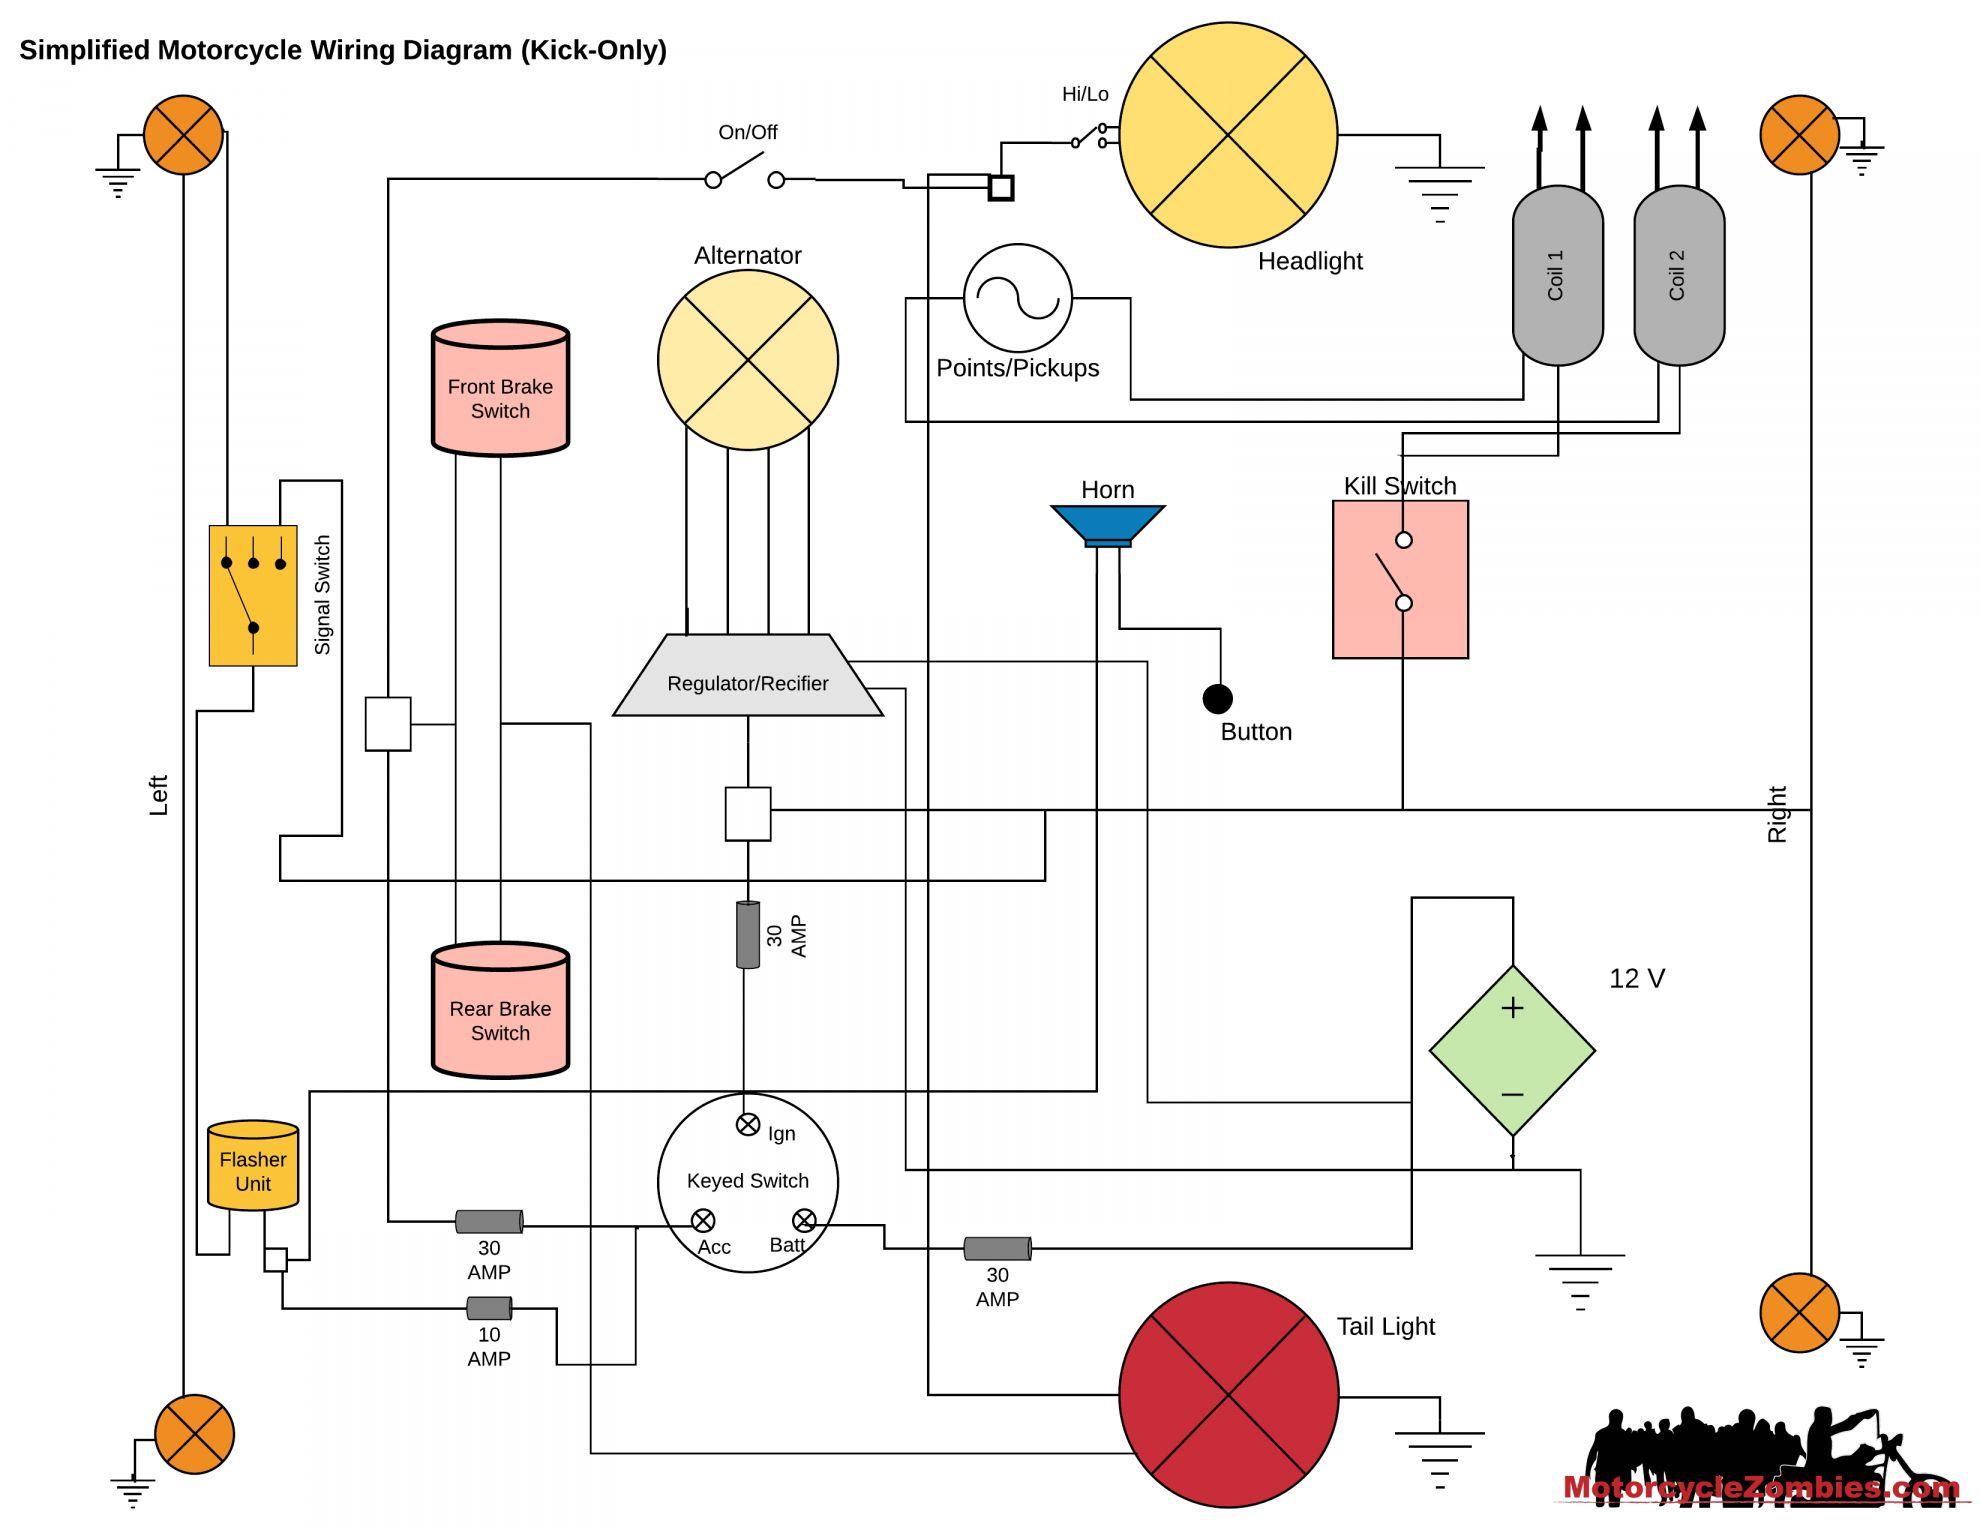 16 Motorcycle Horn Relay Diagram Motorcycle Diagram Wiringg Net In 2020 Motorcycle Wiring Motorcycle Design Diagram